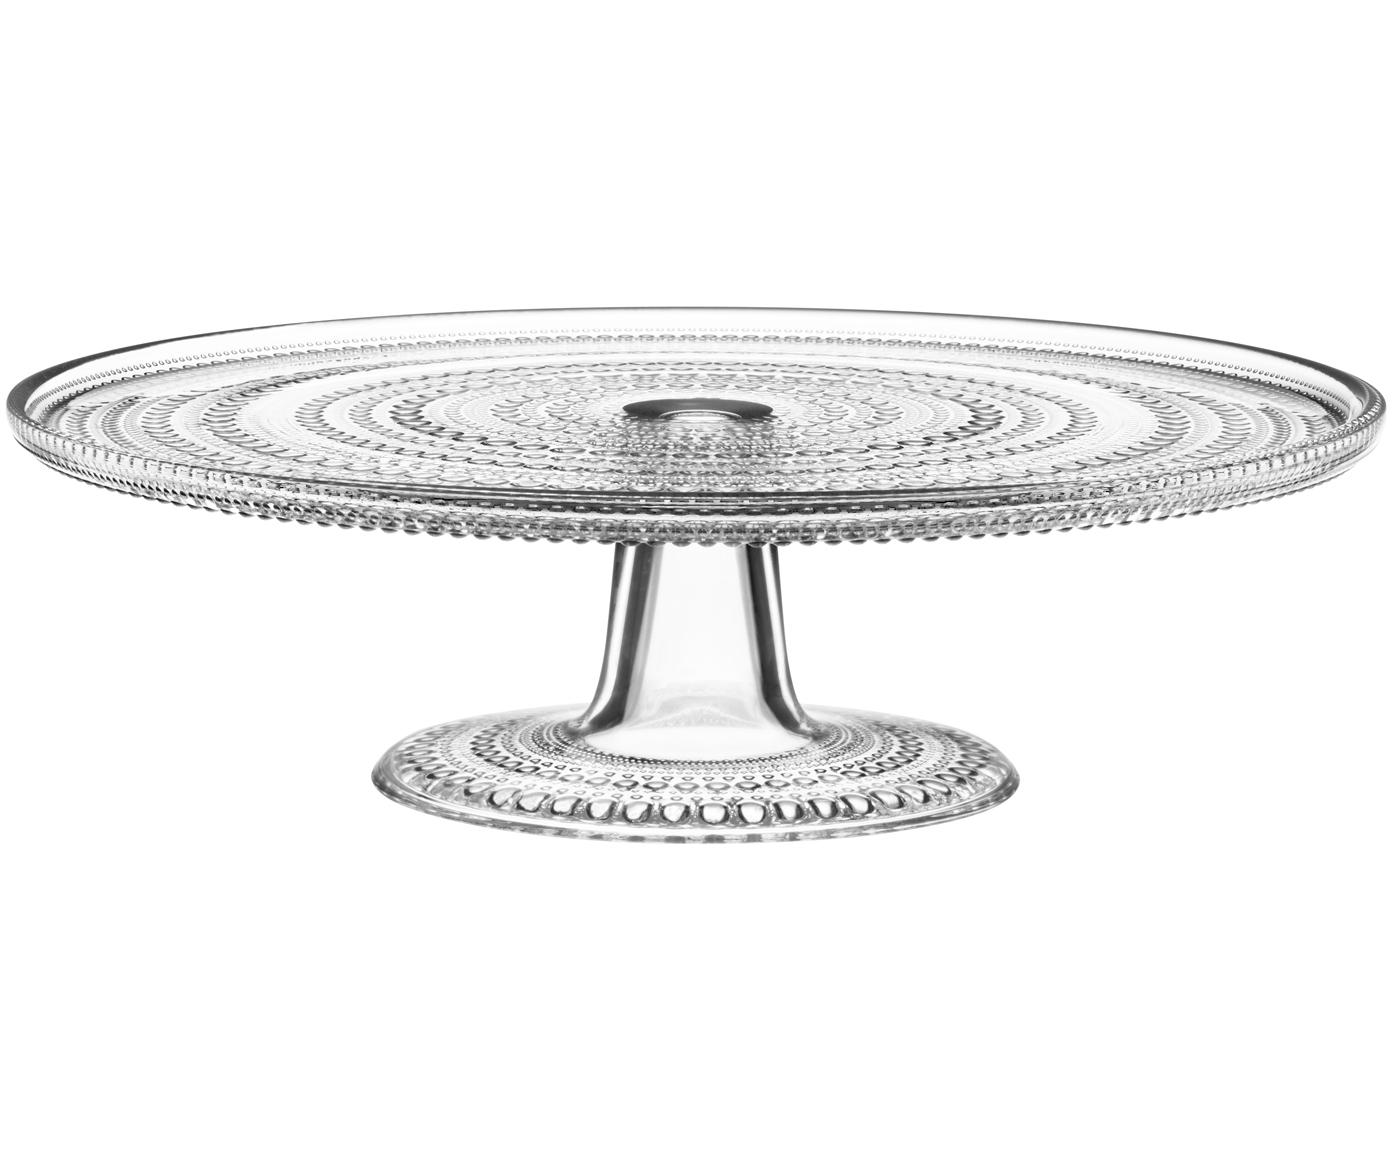 Fuente para postre Kastehelmi, Vidrio, Transparente, Ø 32 cm